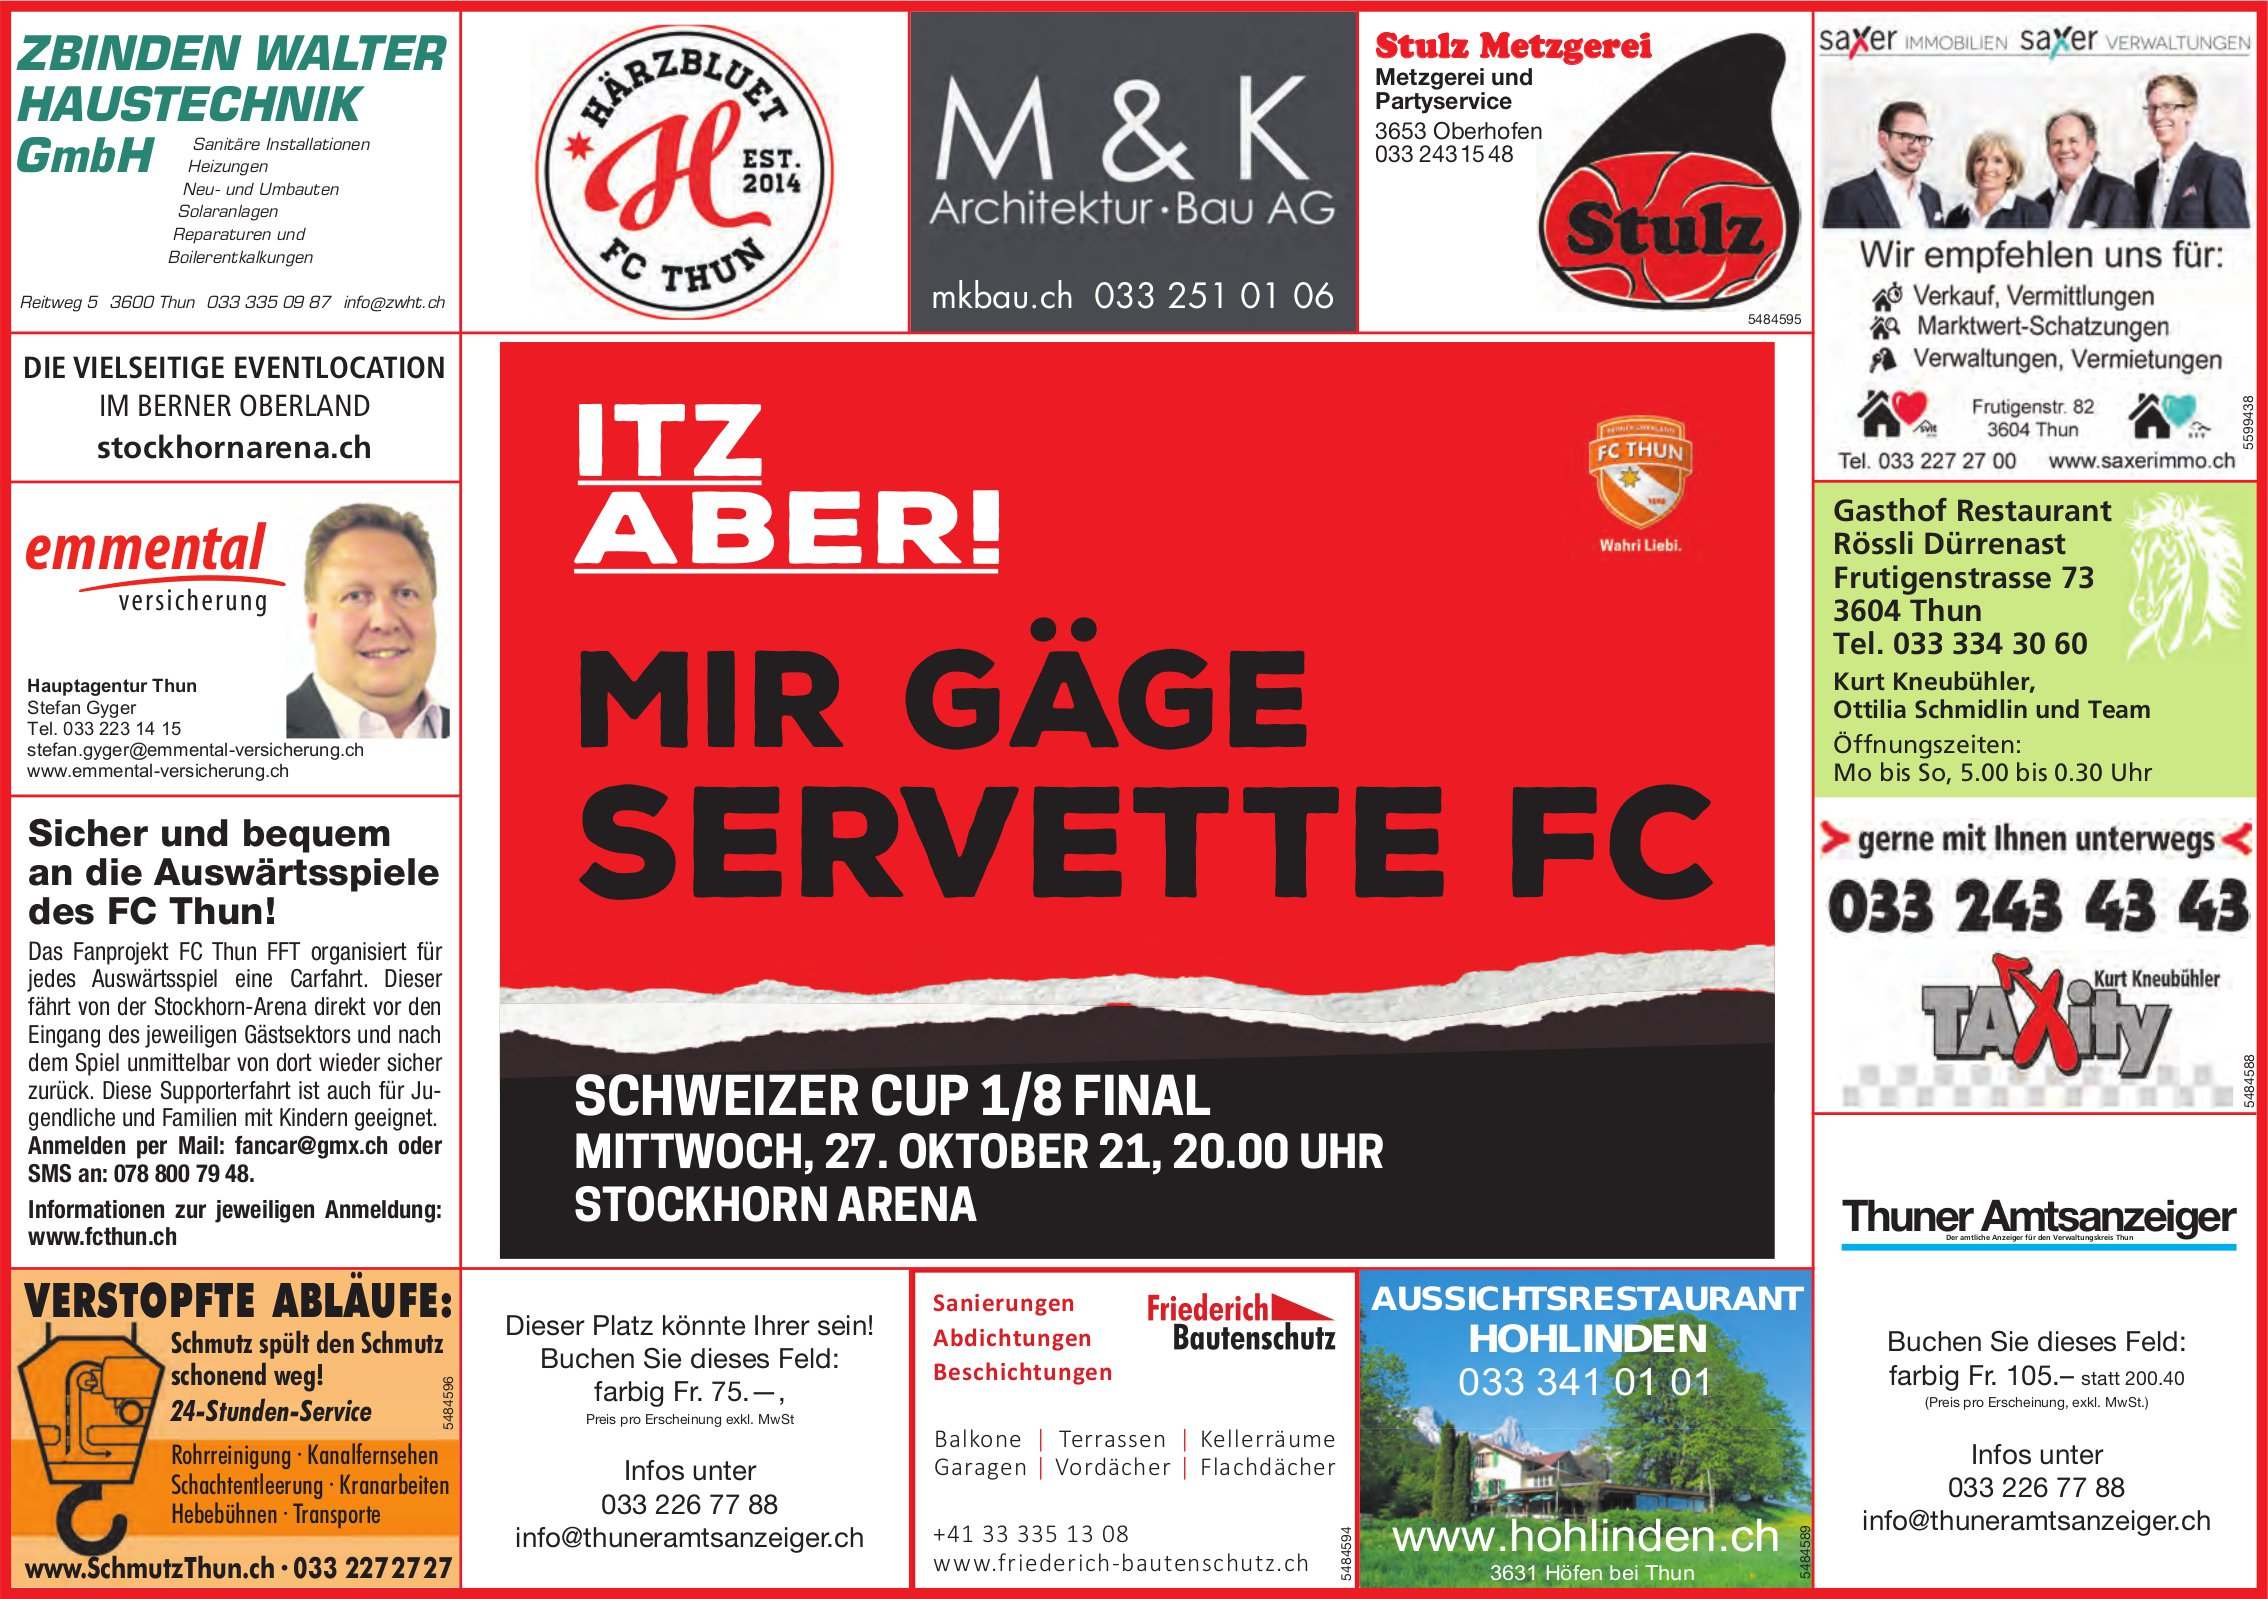 Itz aber! Mir gäge Servette FC, 27. Oktober, Schweizer Cup 1/8 Final, Stockhorn Arena